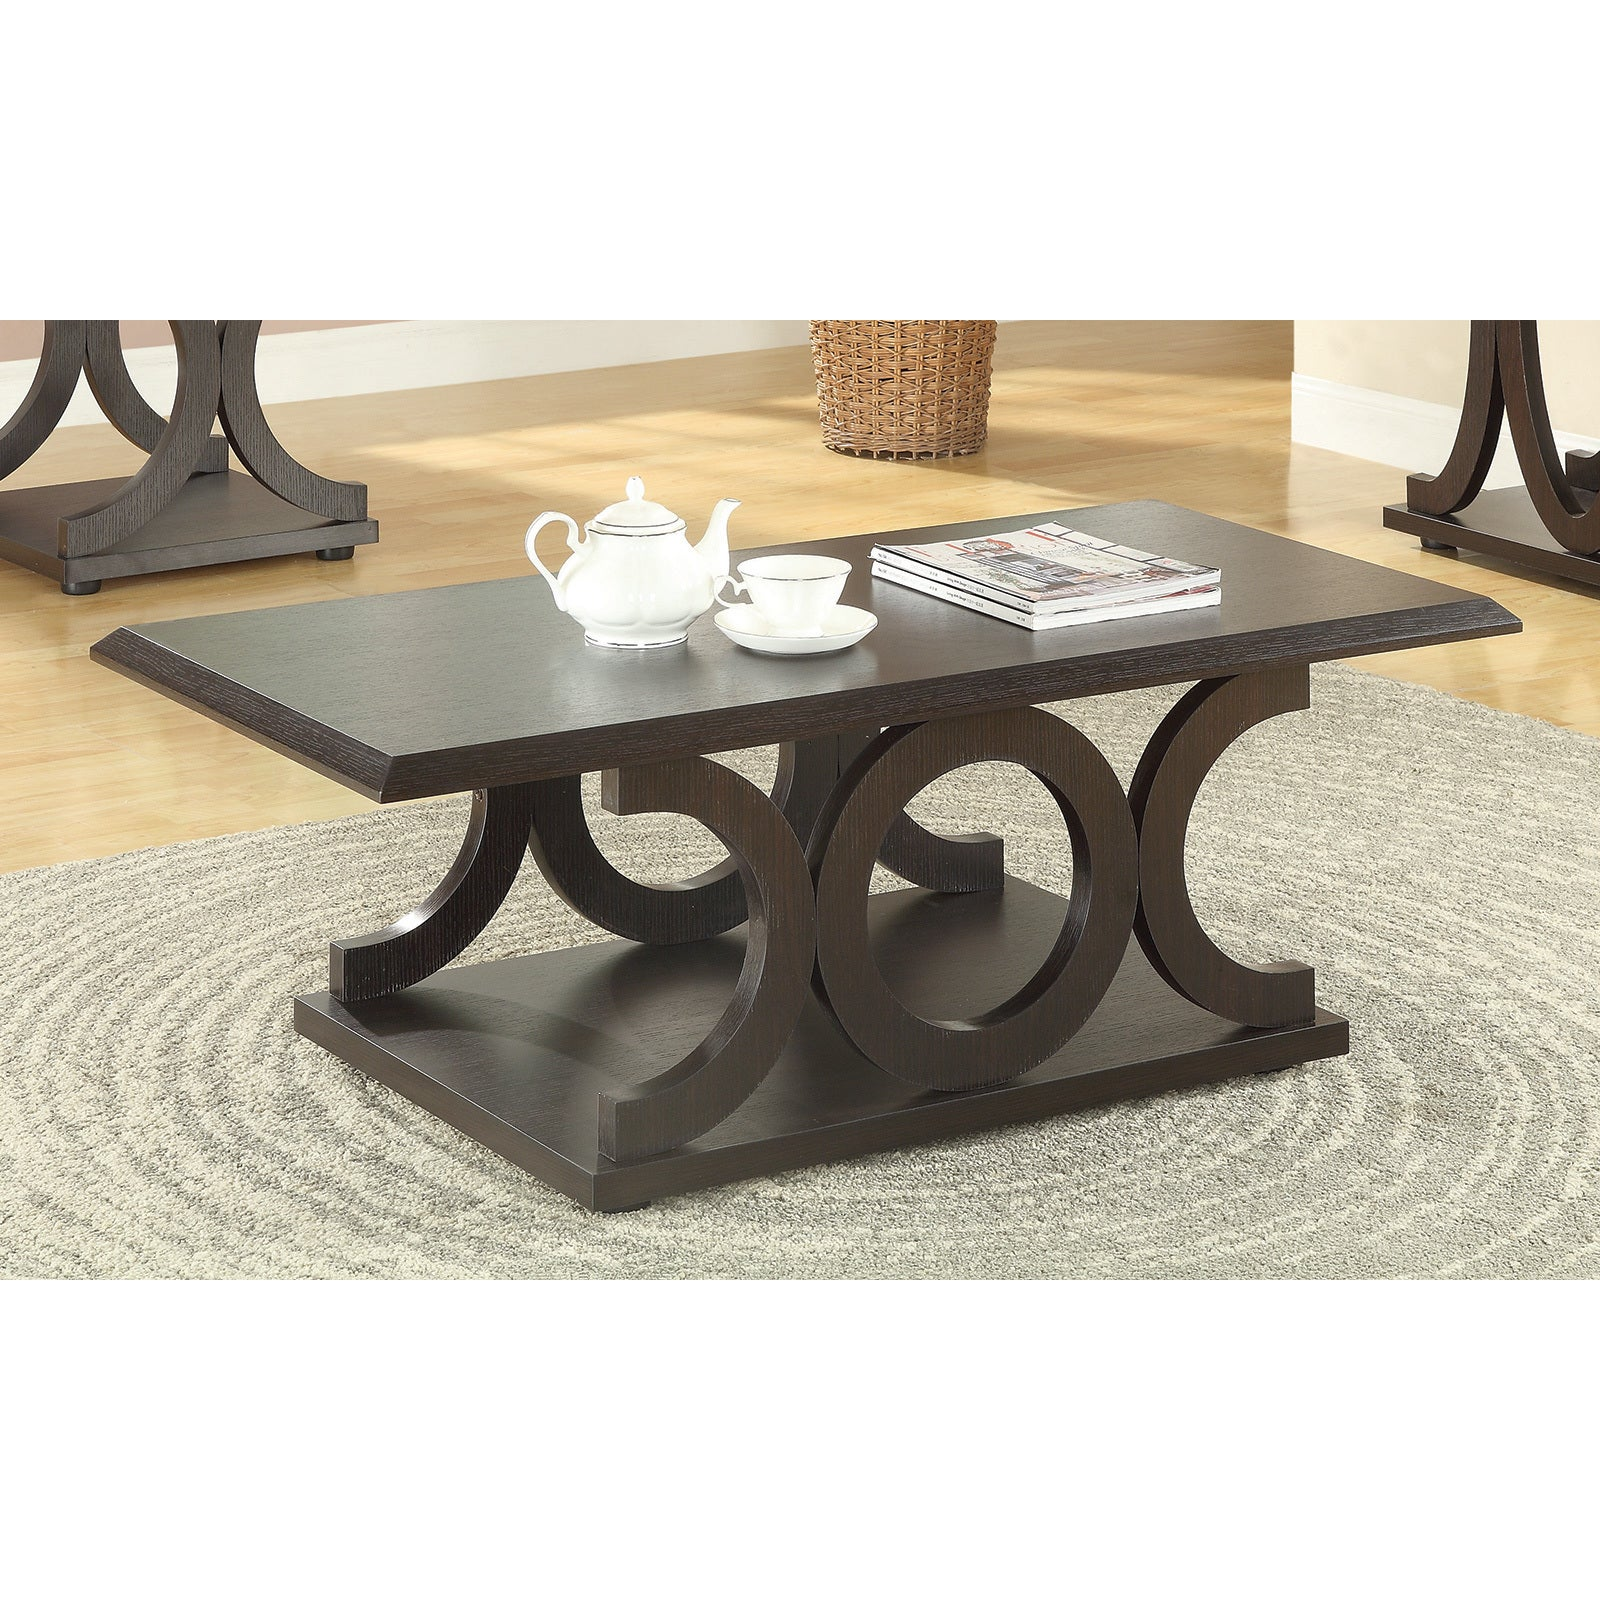 Coaster pany Furniture Cappuccino Coffee Table Free Shipping